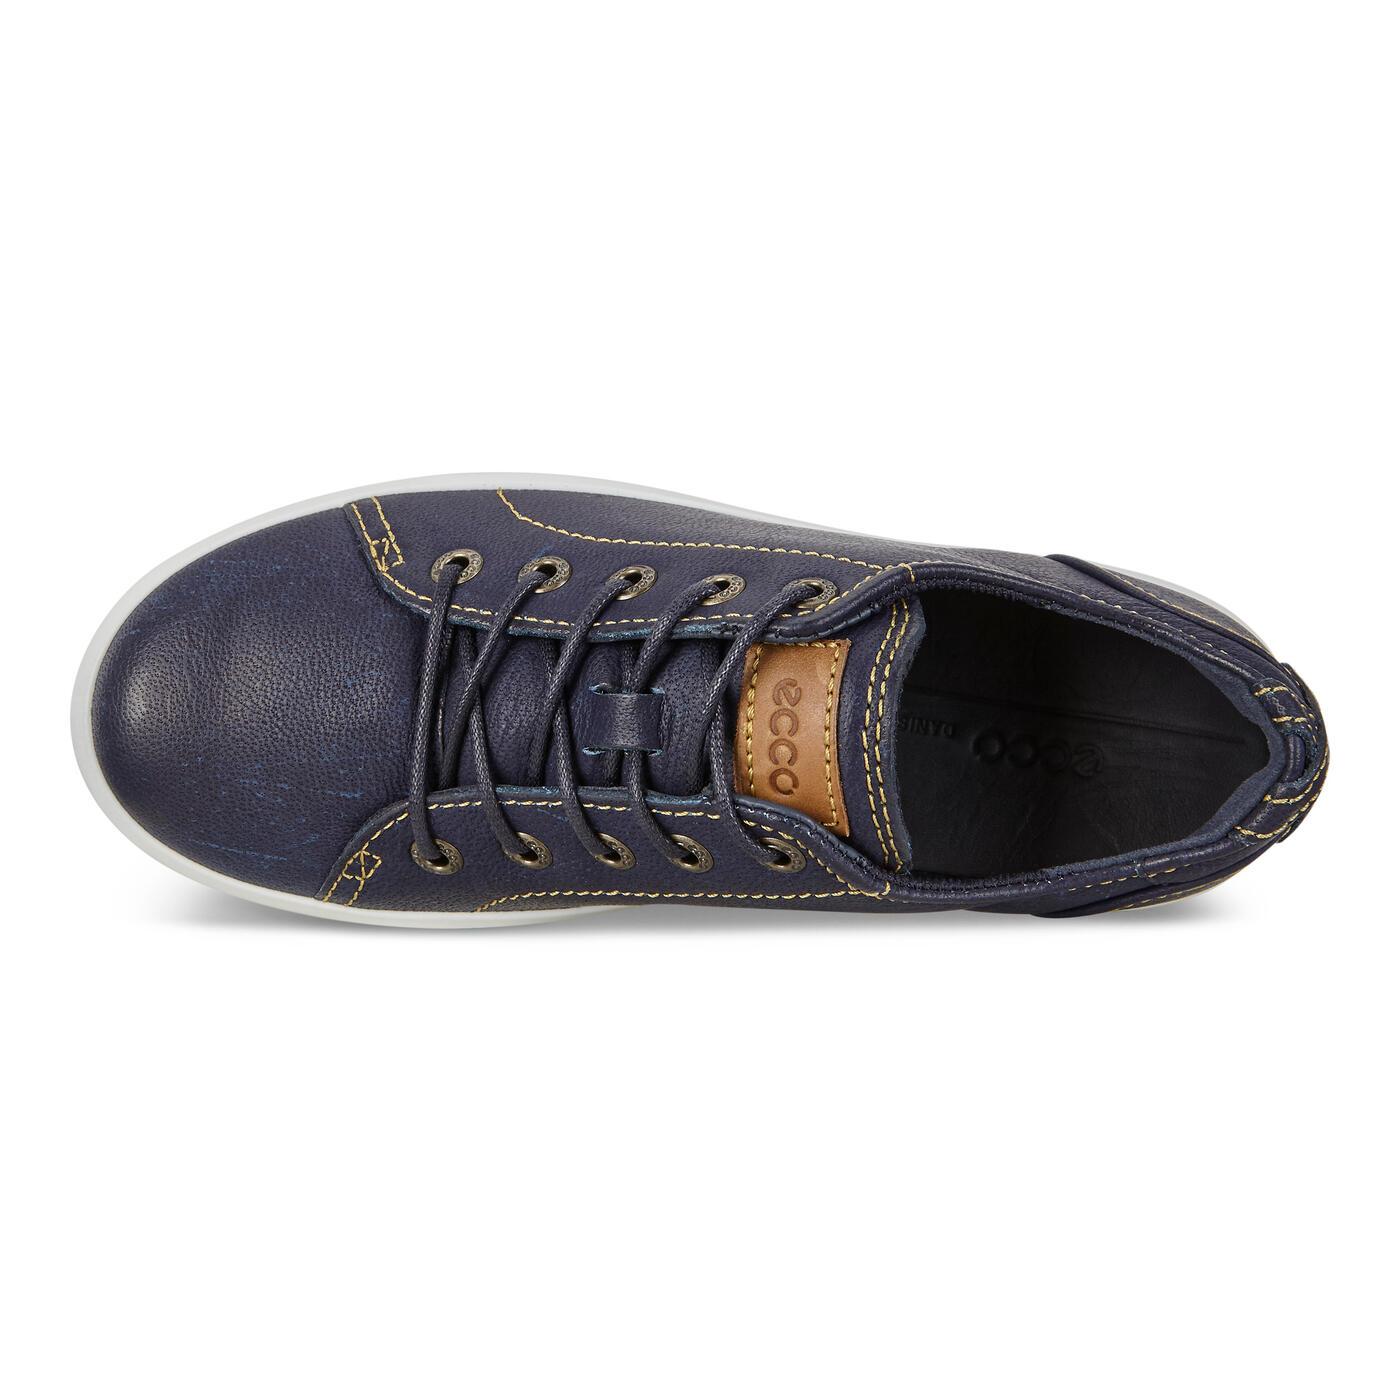 ECCO S8 Sneaker